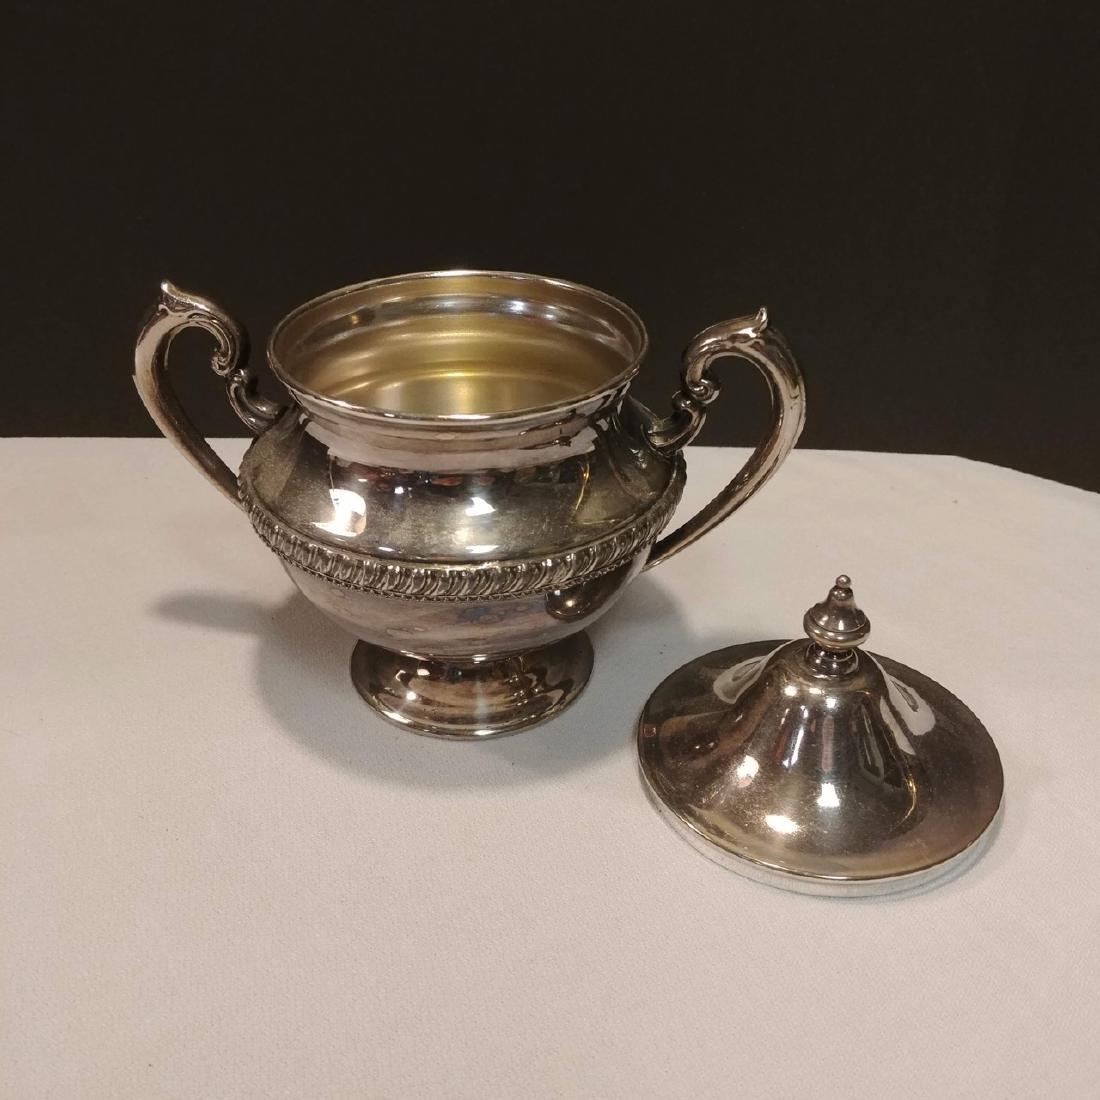 Plated Silver Tea Set - 5